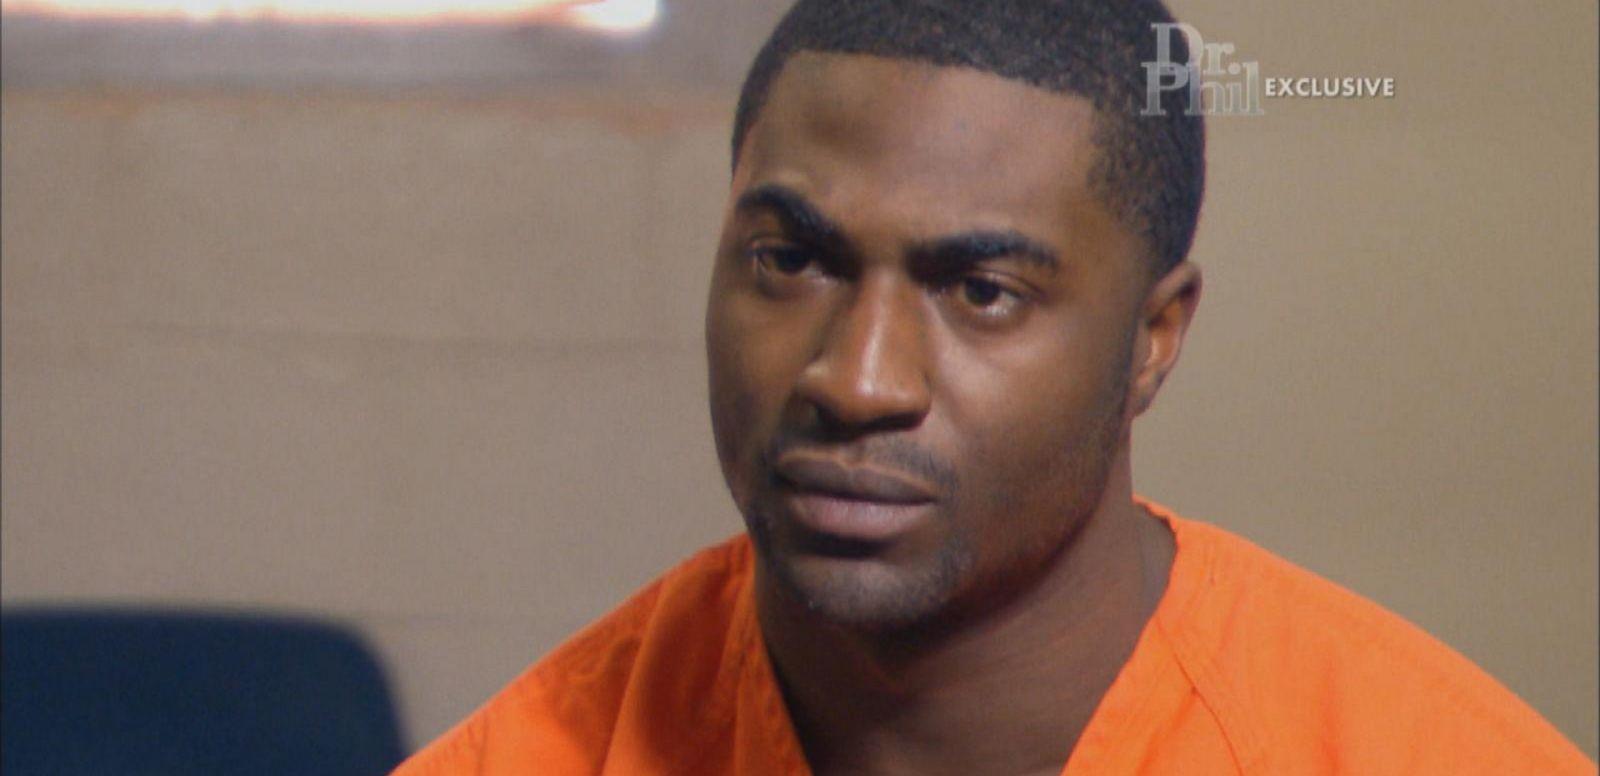 VIDEO: Vanderbilt Football Player Talks to Dr. Phil About Rape Conviction